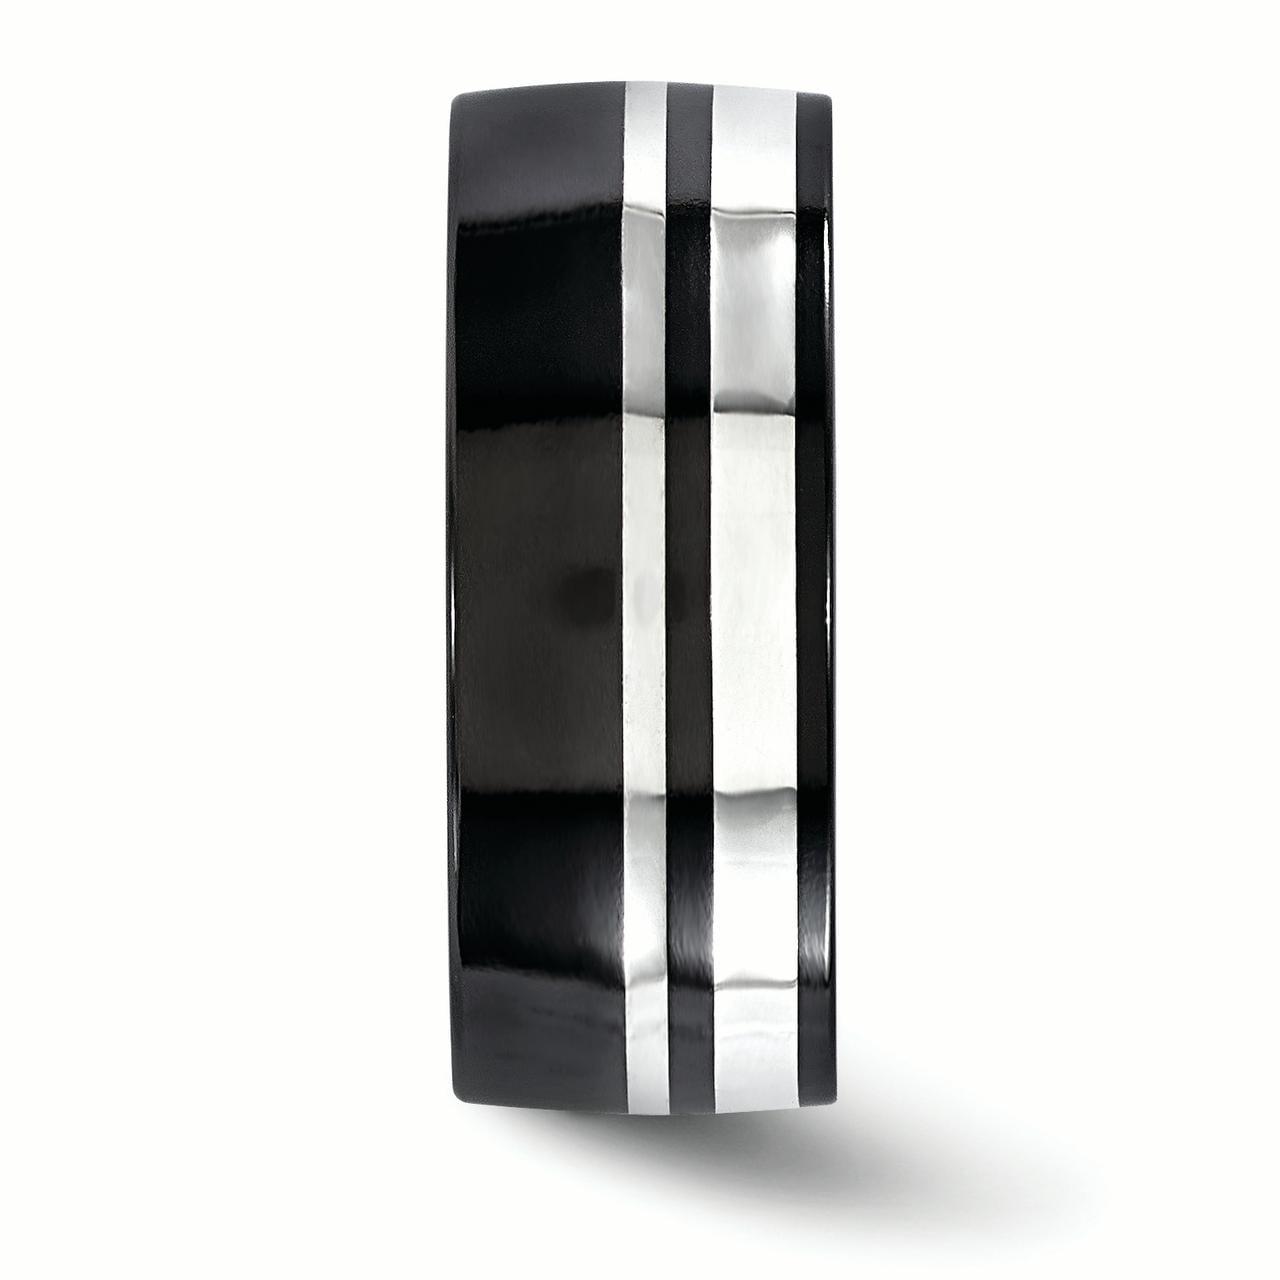 Edward Mirell Black Ti & Sterling Silver 9mm Polished Band Size 8 - image 2 of 3